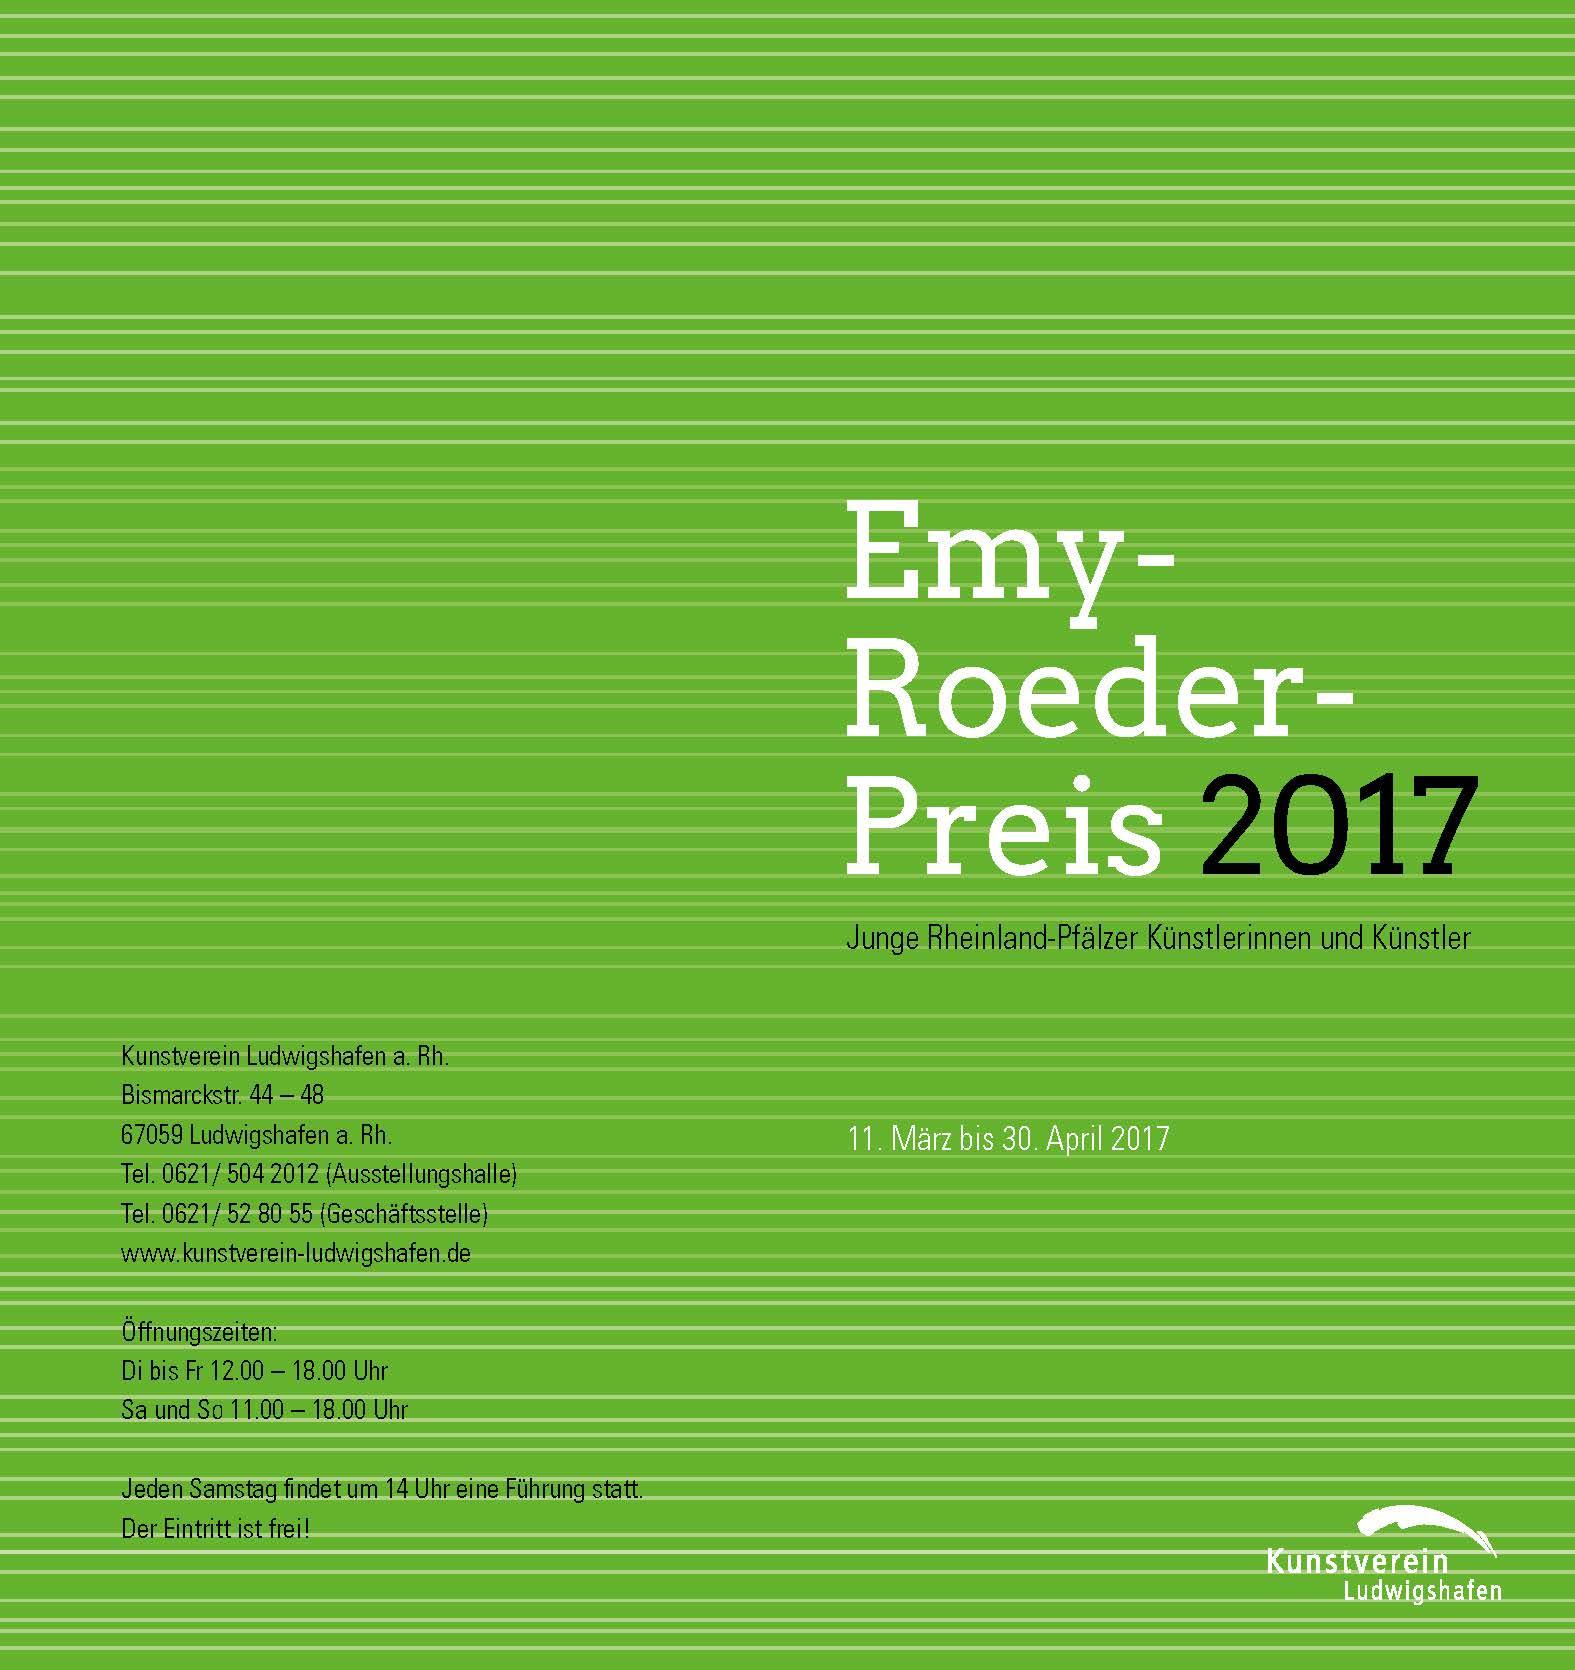 Emy2017-EK_0802_Seite_1.jpg